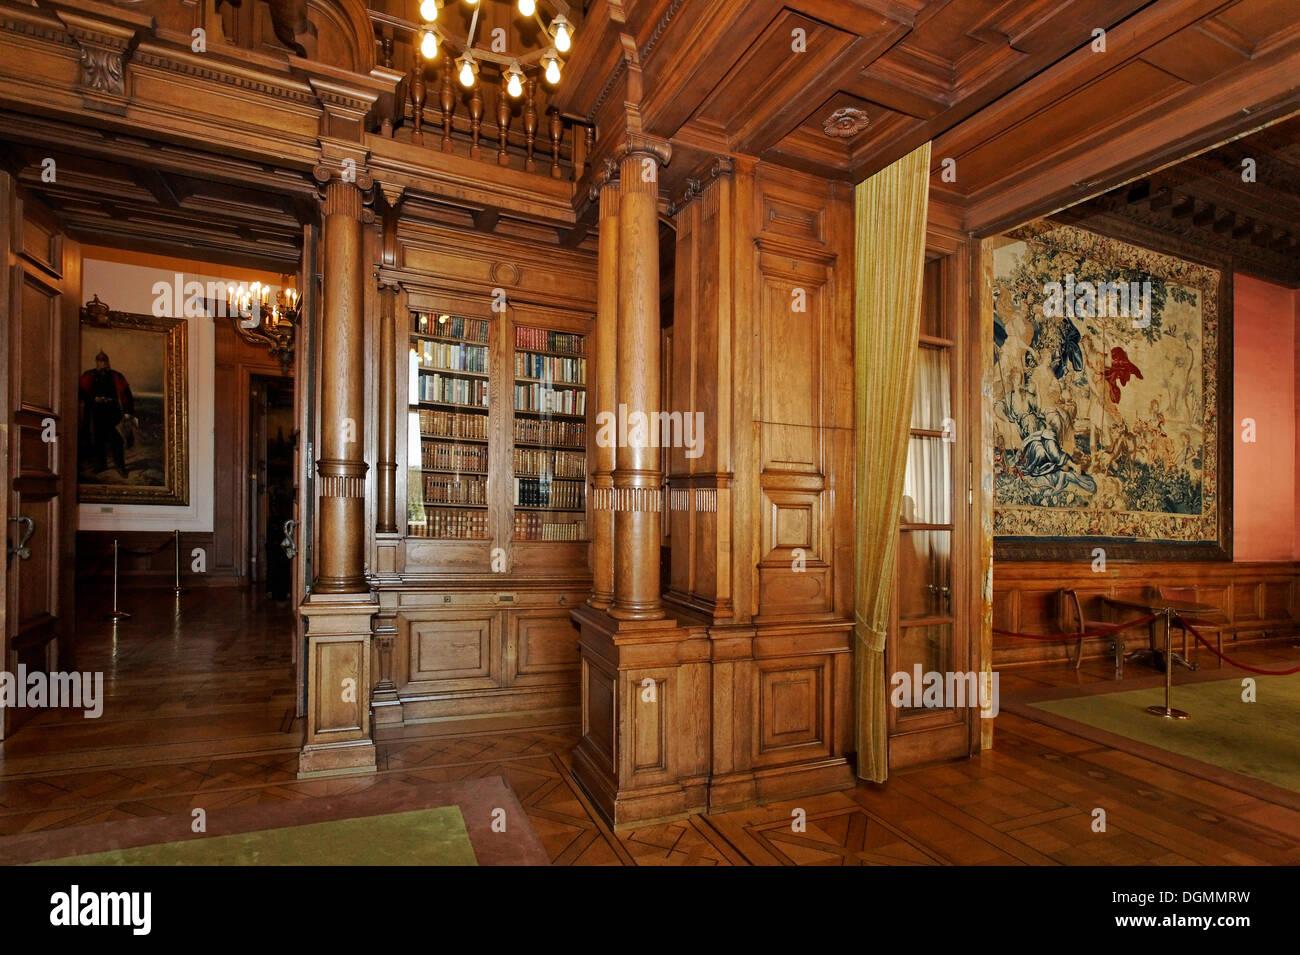 Biblioteca con paneles de madera, Villa Huegel, antiguo hogar de la familia Krupp, Essen-Baldeney, Renania del Norte-Westfalia Imagen De Stock